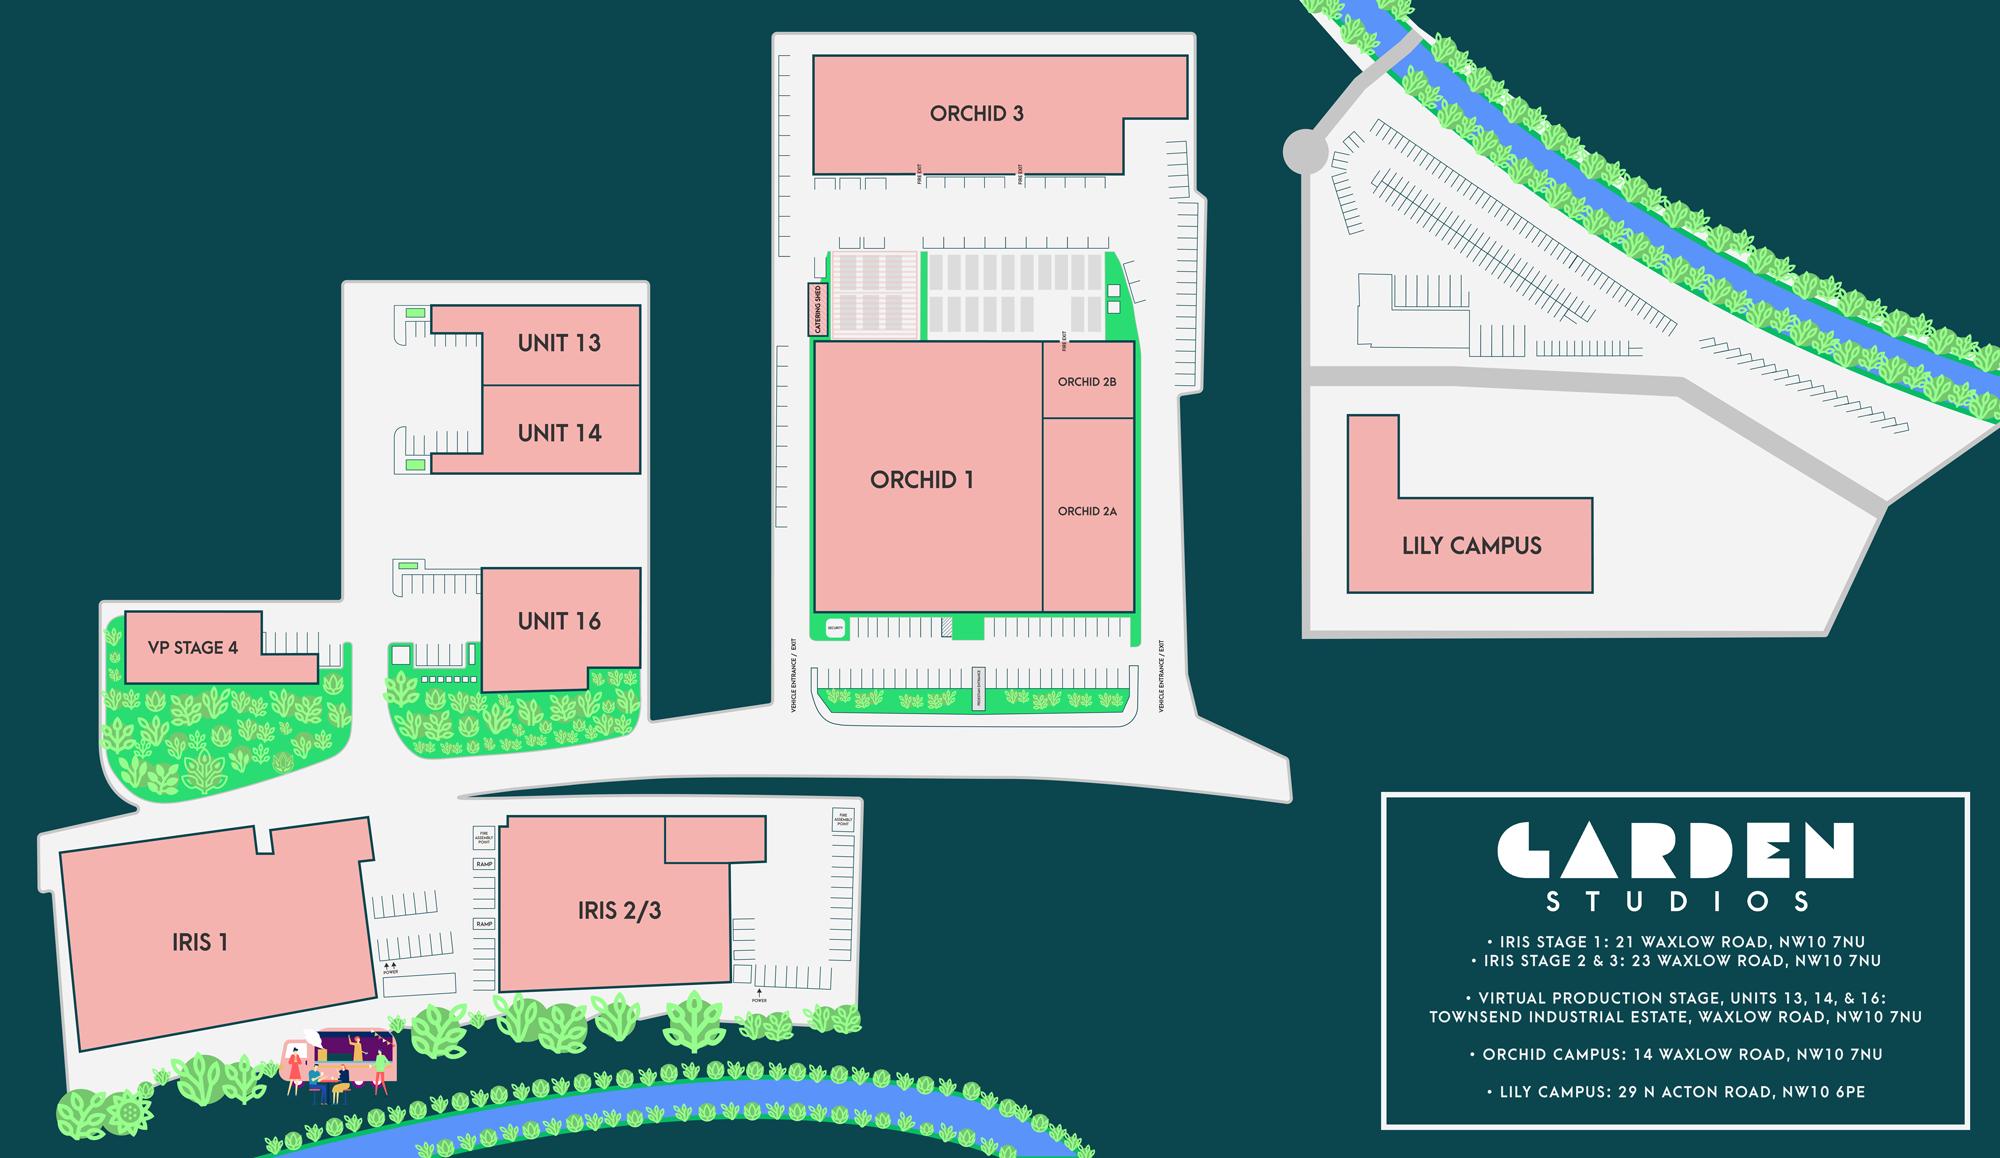 The Garden Studios Campus Map